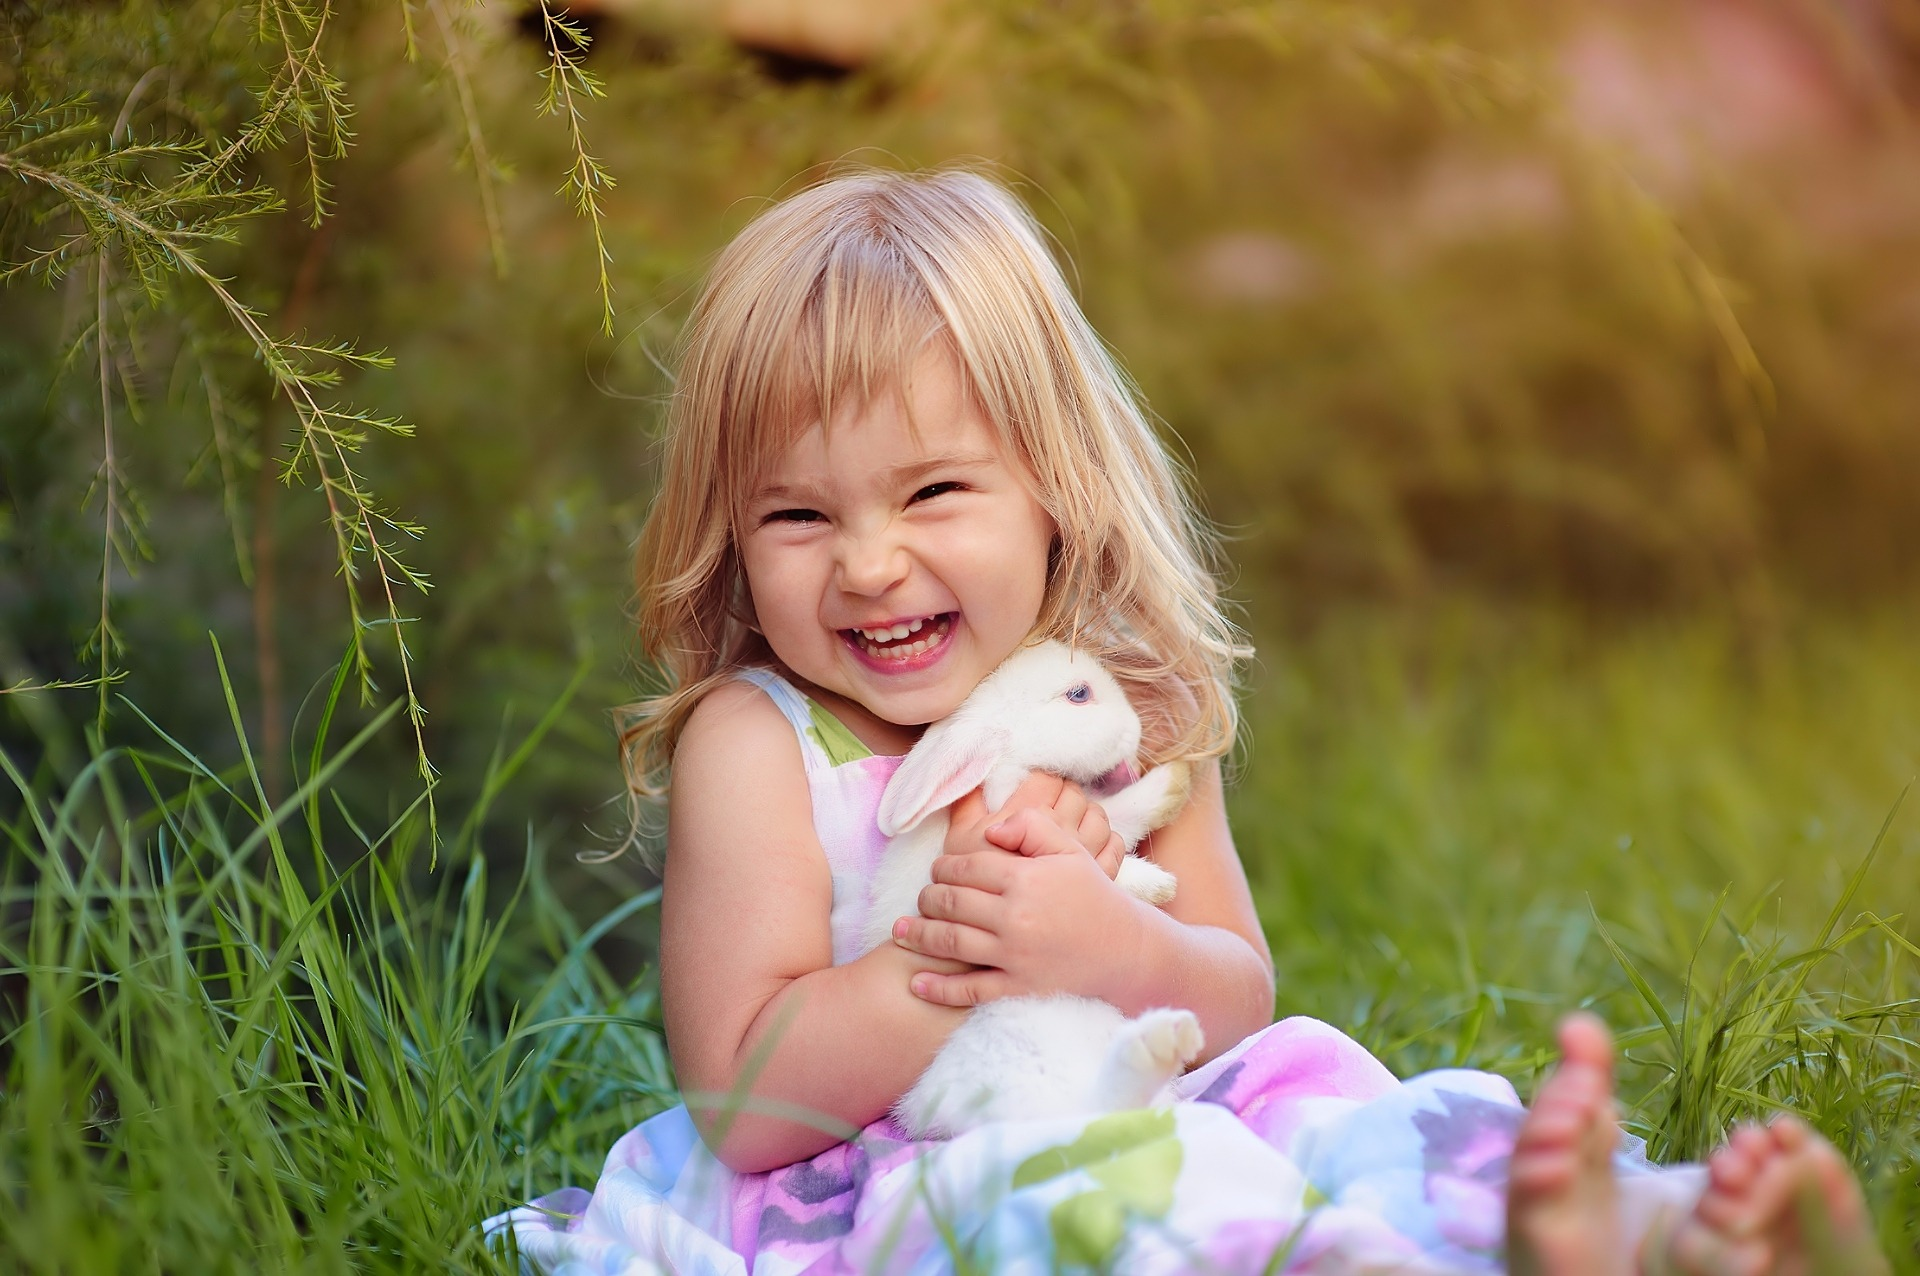 Яндекс картинки с детьми, юбилеем